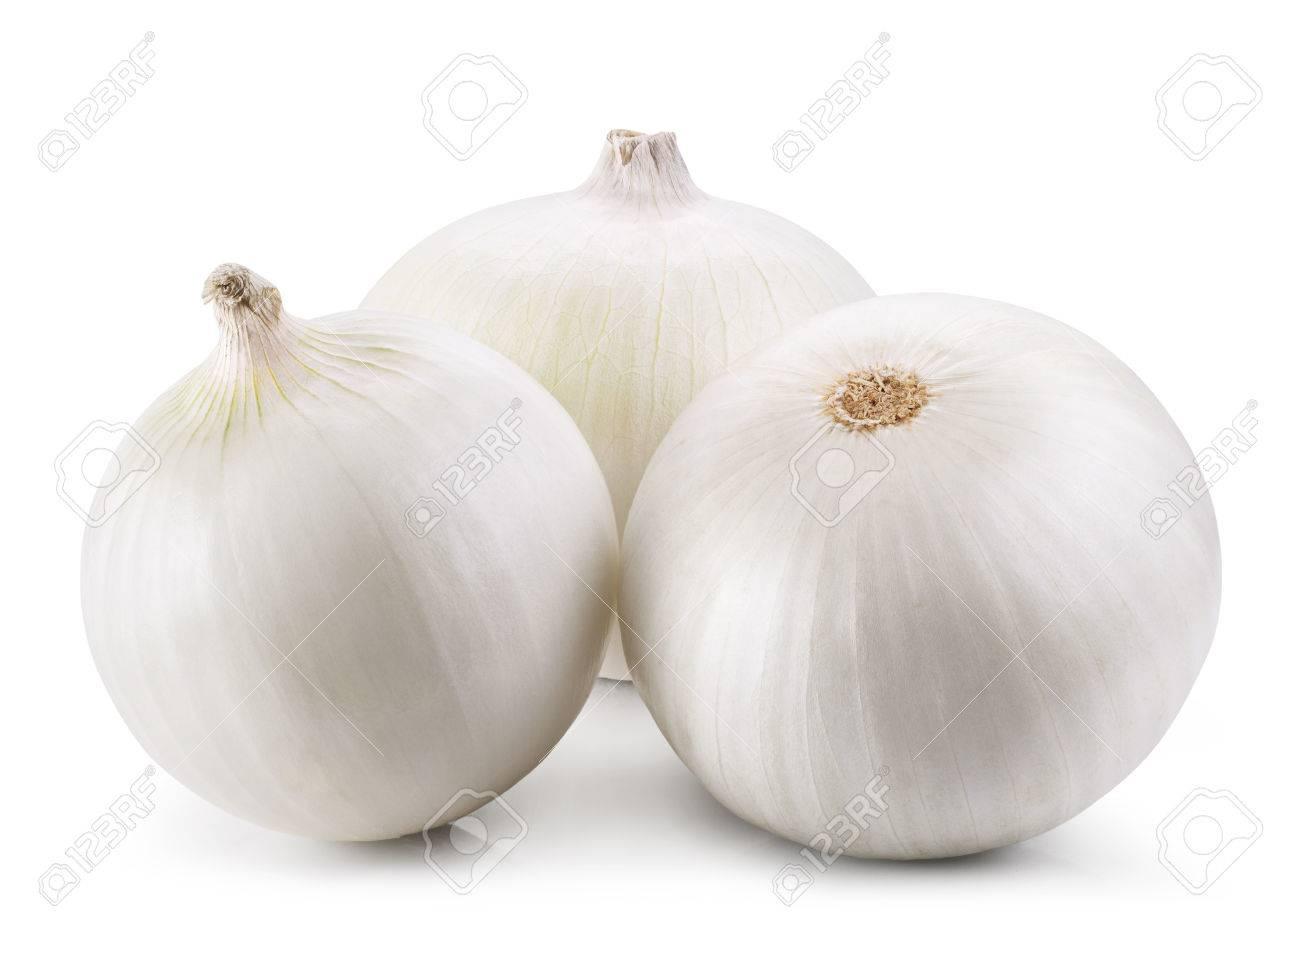 Onion isolated on white background - 44061251